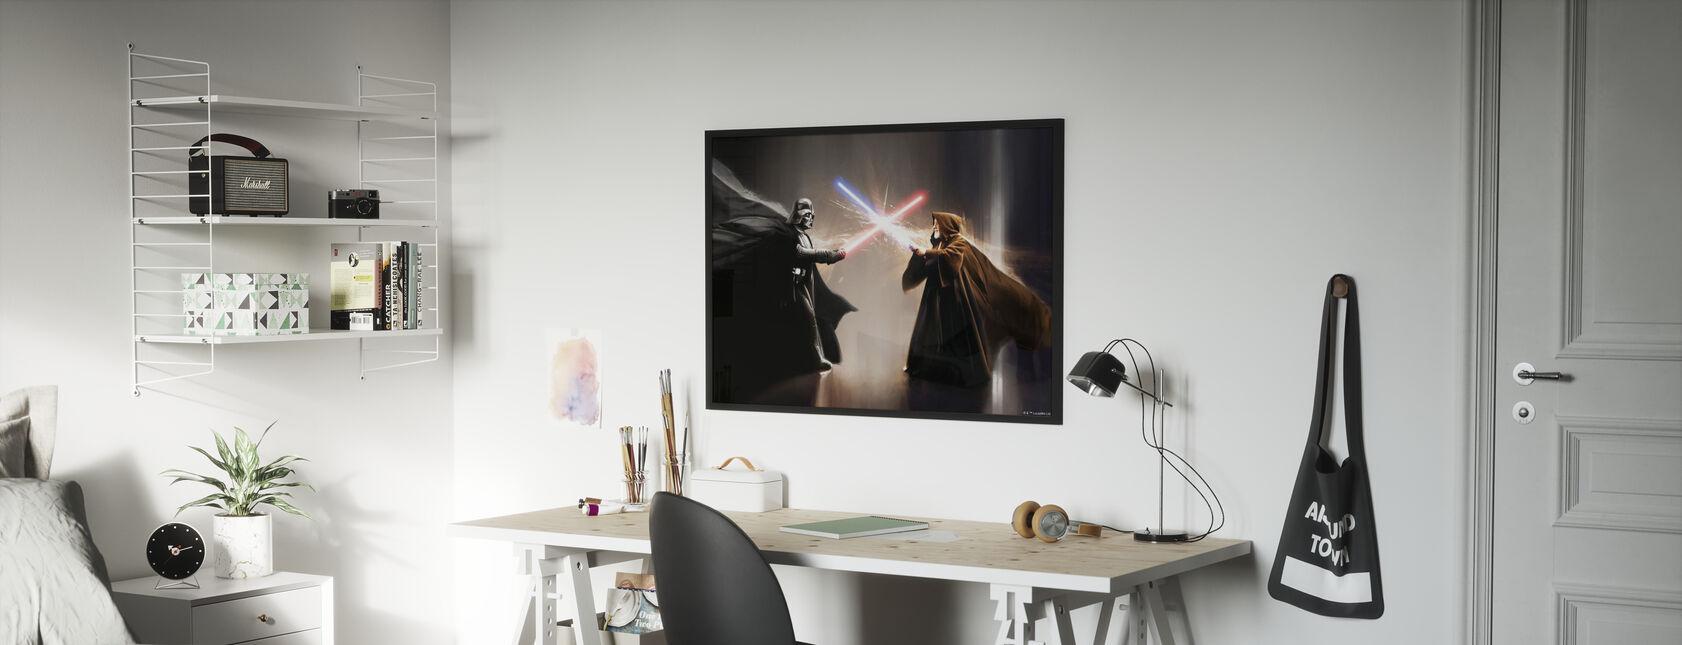 Star Wars - Darth Vader og Obi-Wan Kenobi - Innrammet bilde - Barnerom